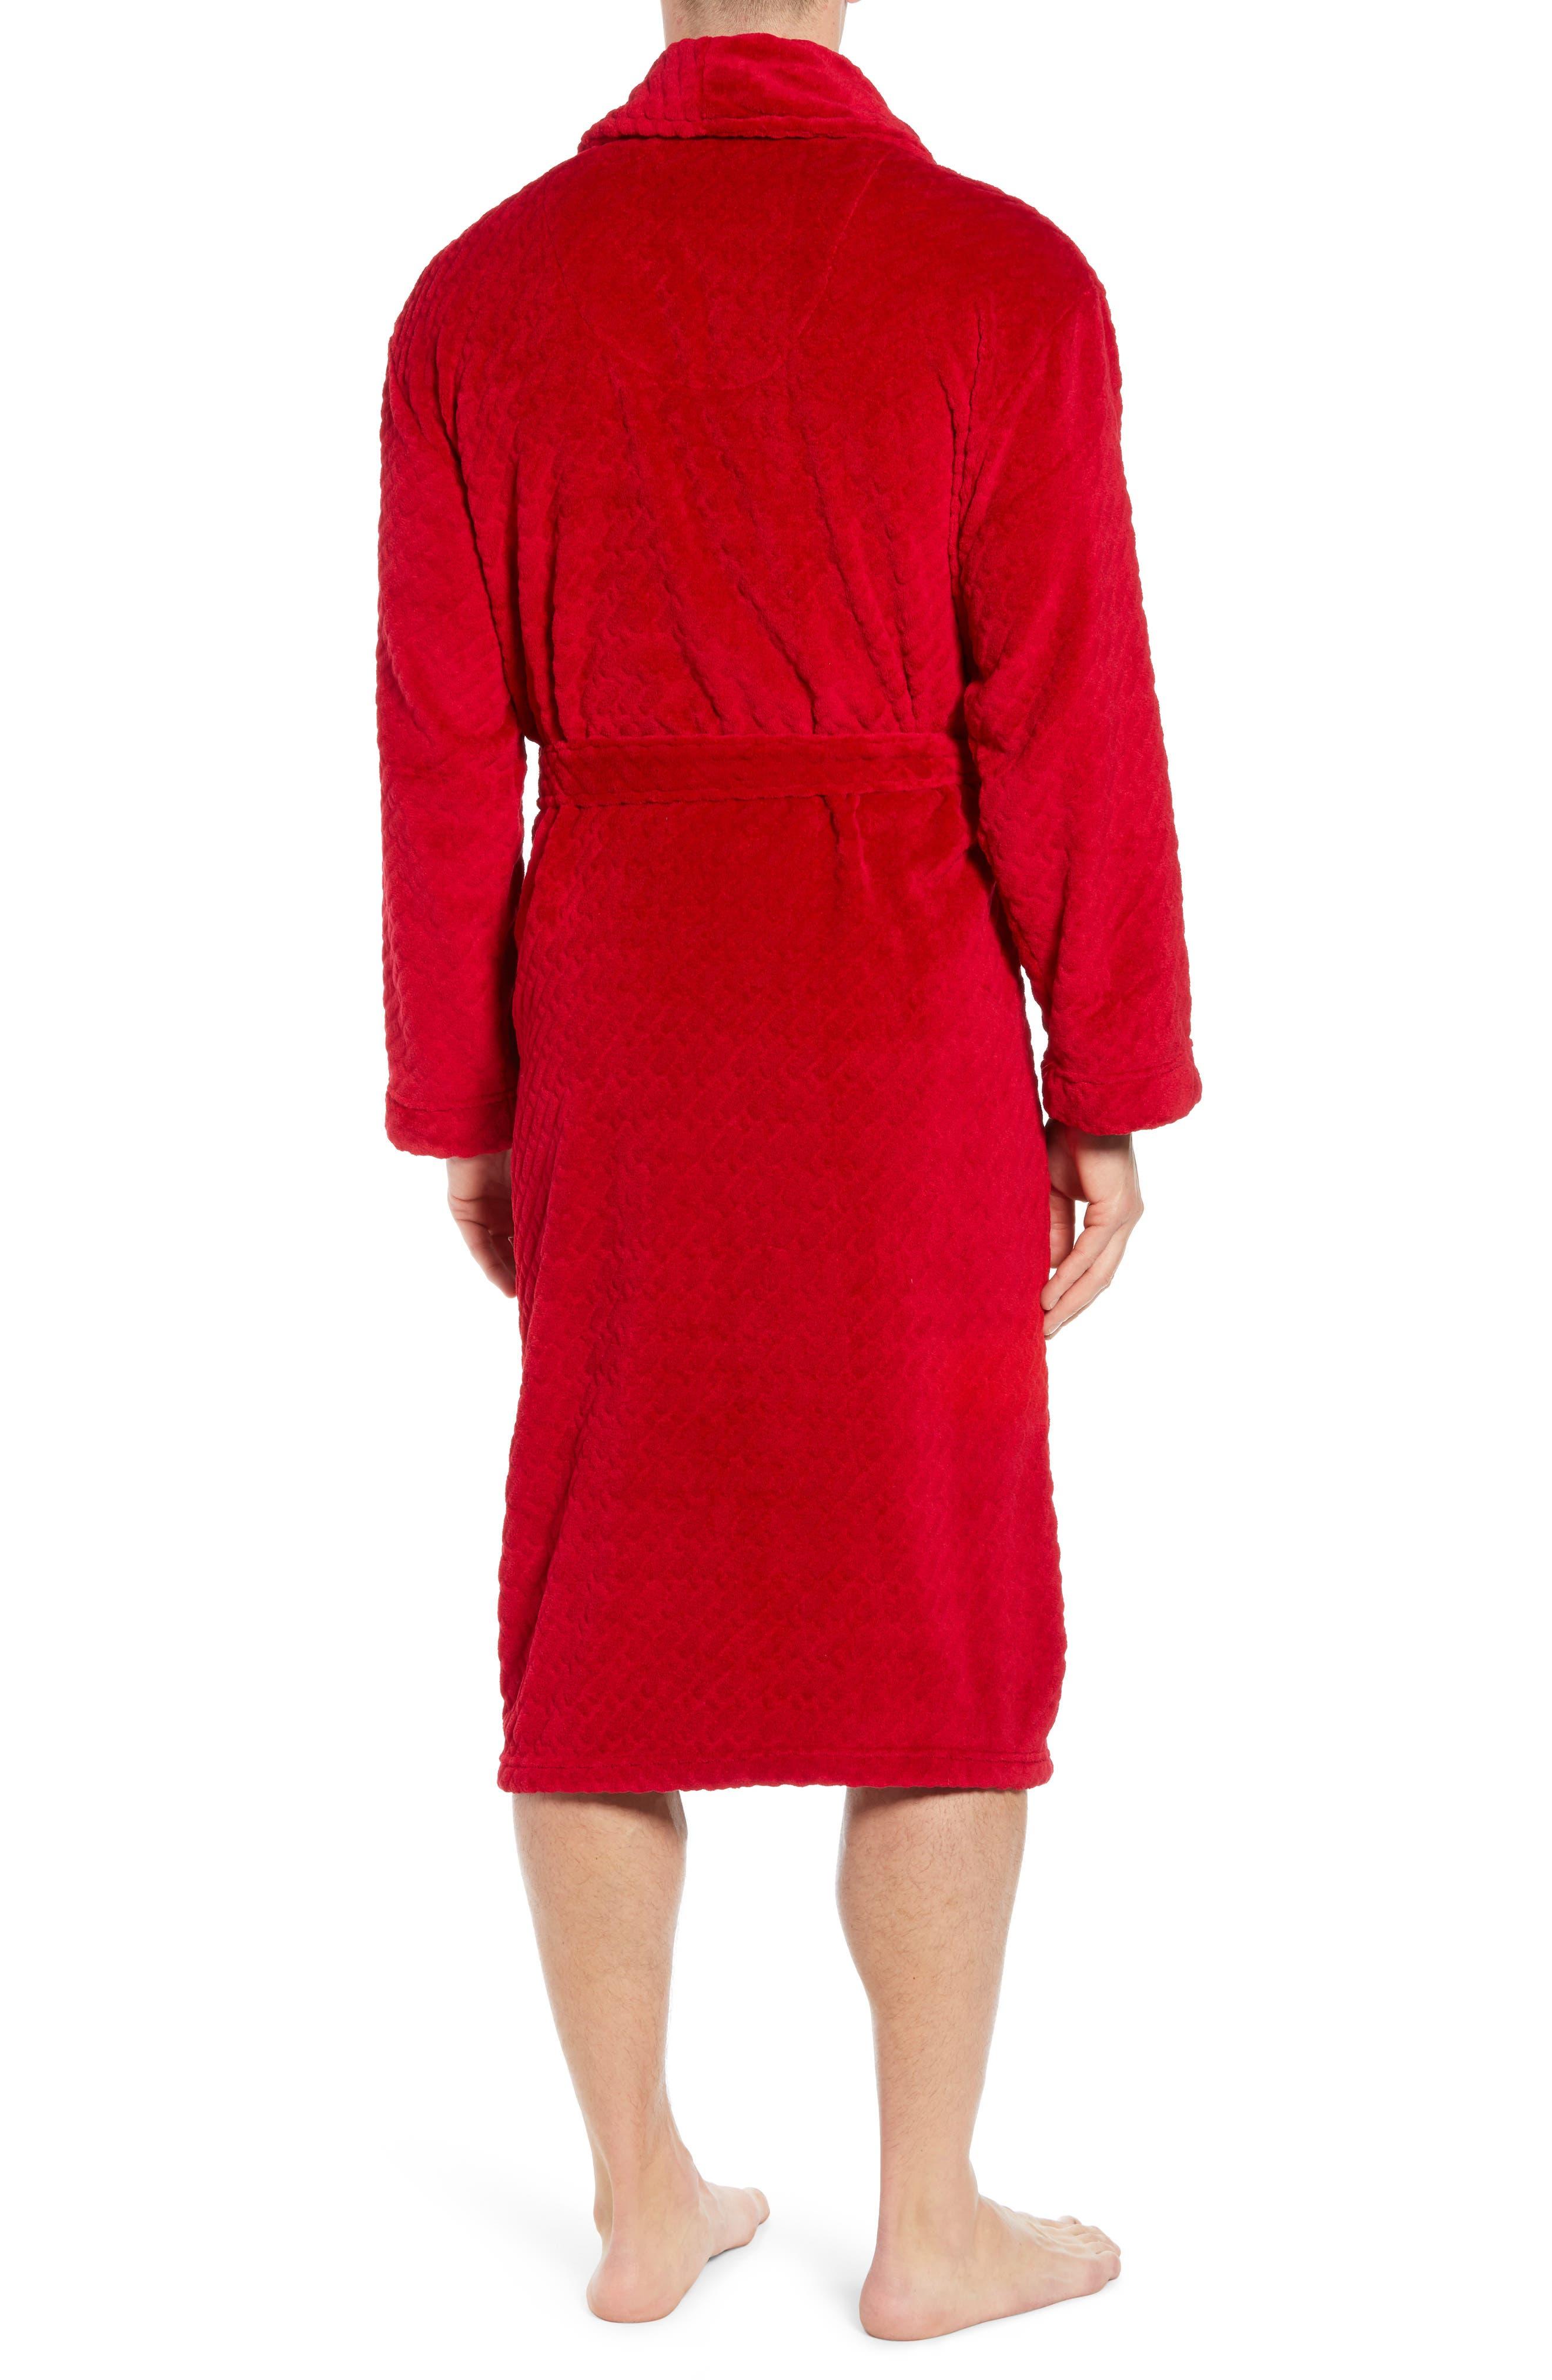 MAJESTIC INTERNATIONAL, Fireside Fleece Robe, Alternate thumbnail 2, color, RED RIBBON